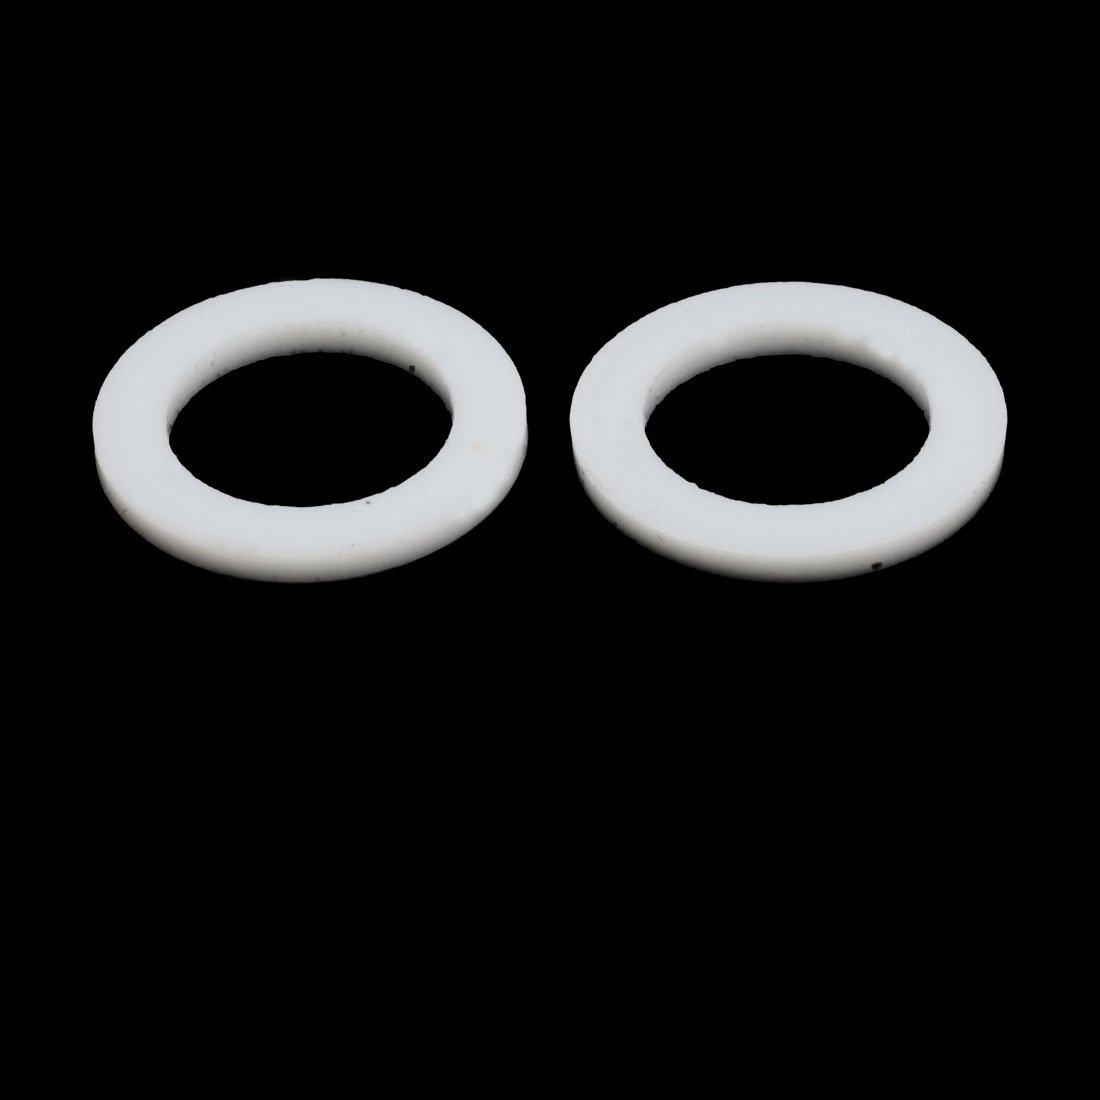 20x22mmx14mmx2mm PTFE Flache Unterlegscheibe Flansch Dichtungsring weiß